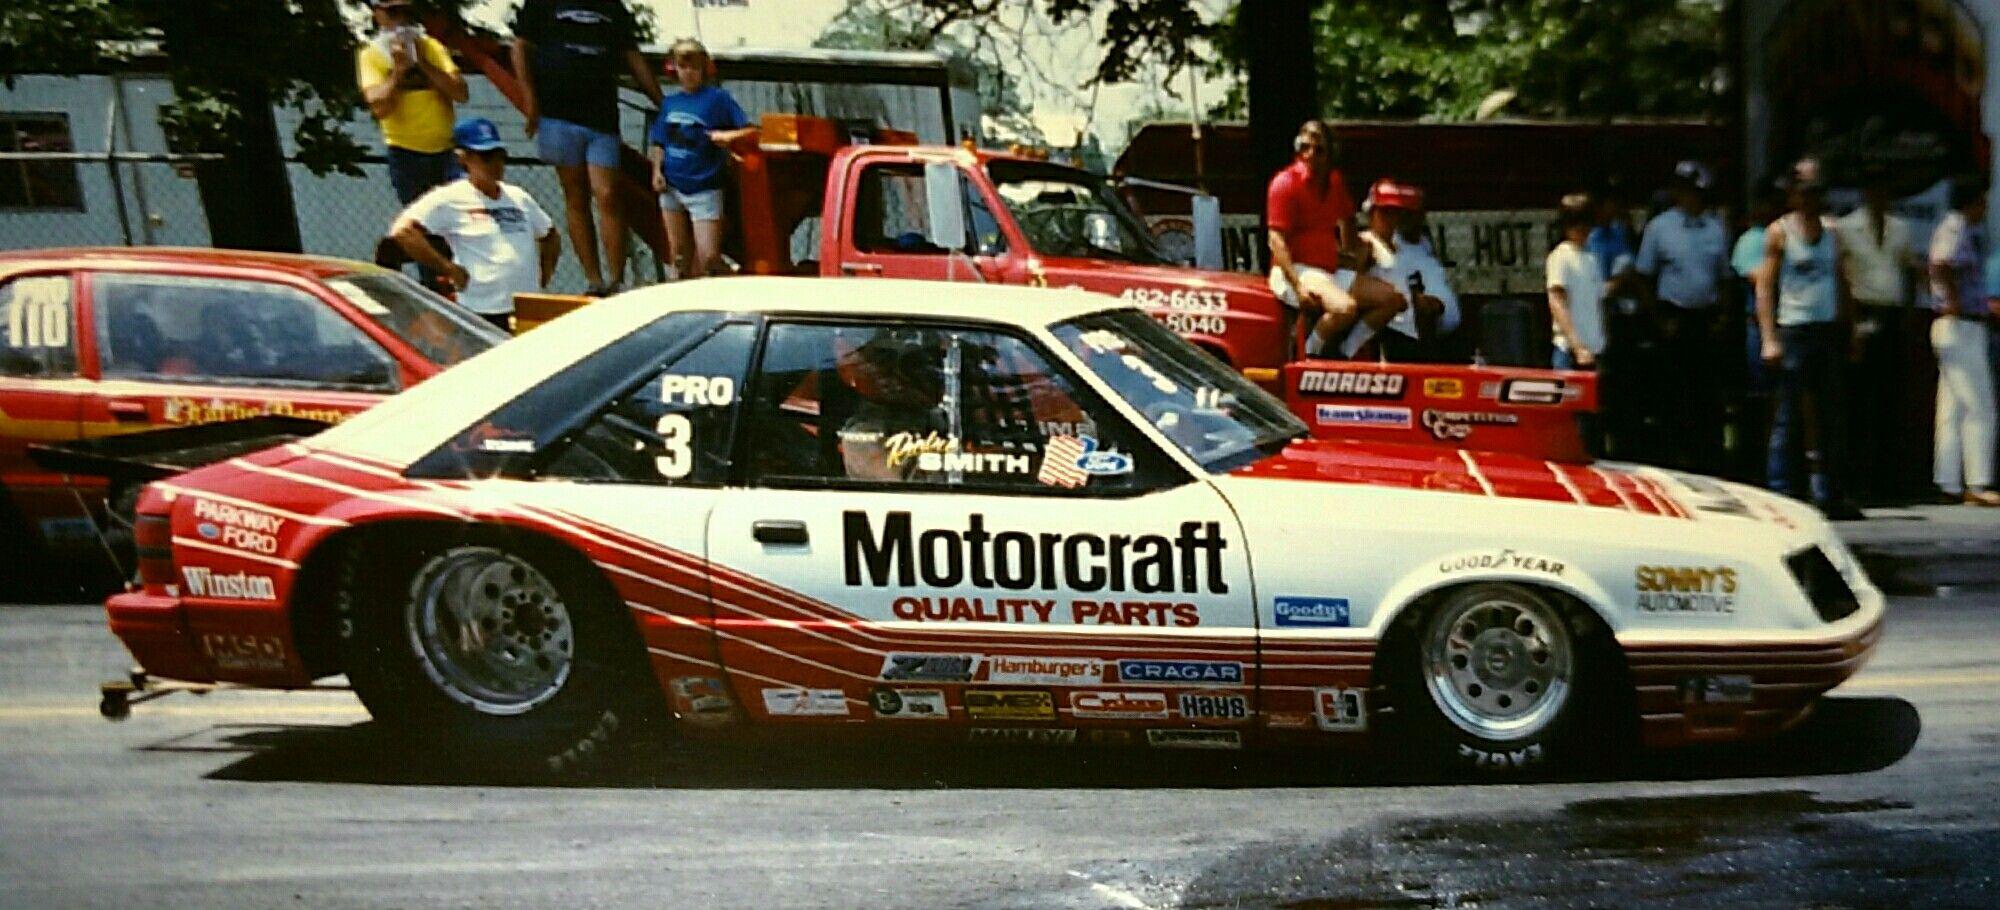 Rickie Smith Drag Racing Cars Ford Racing Vintage Racing